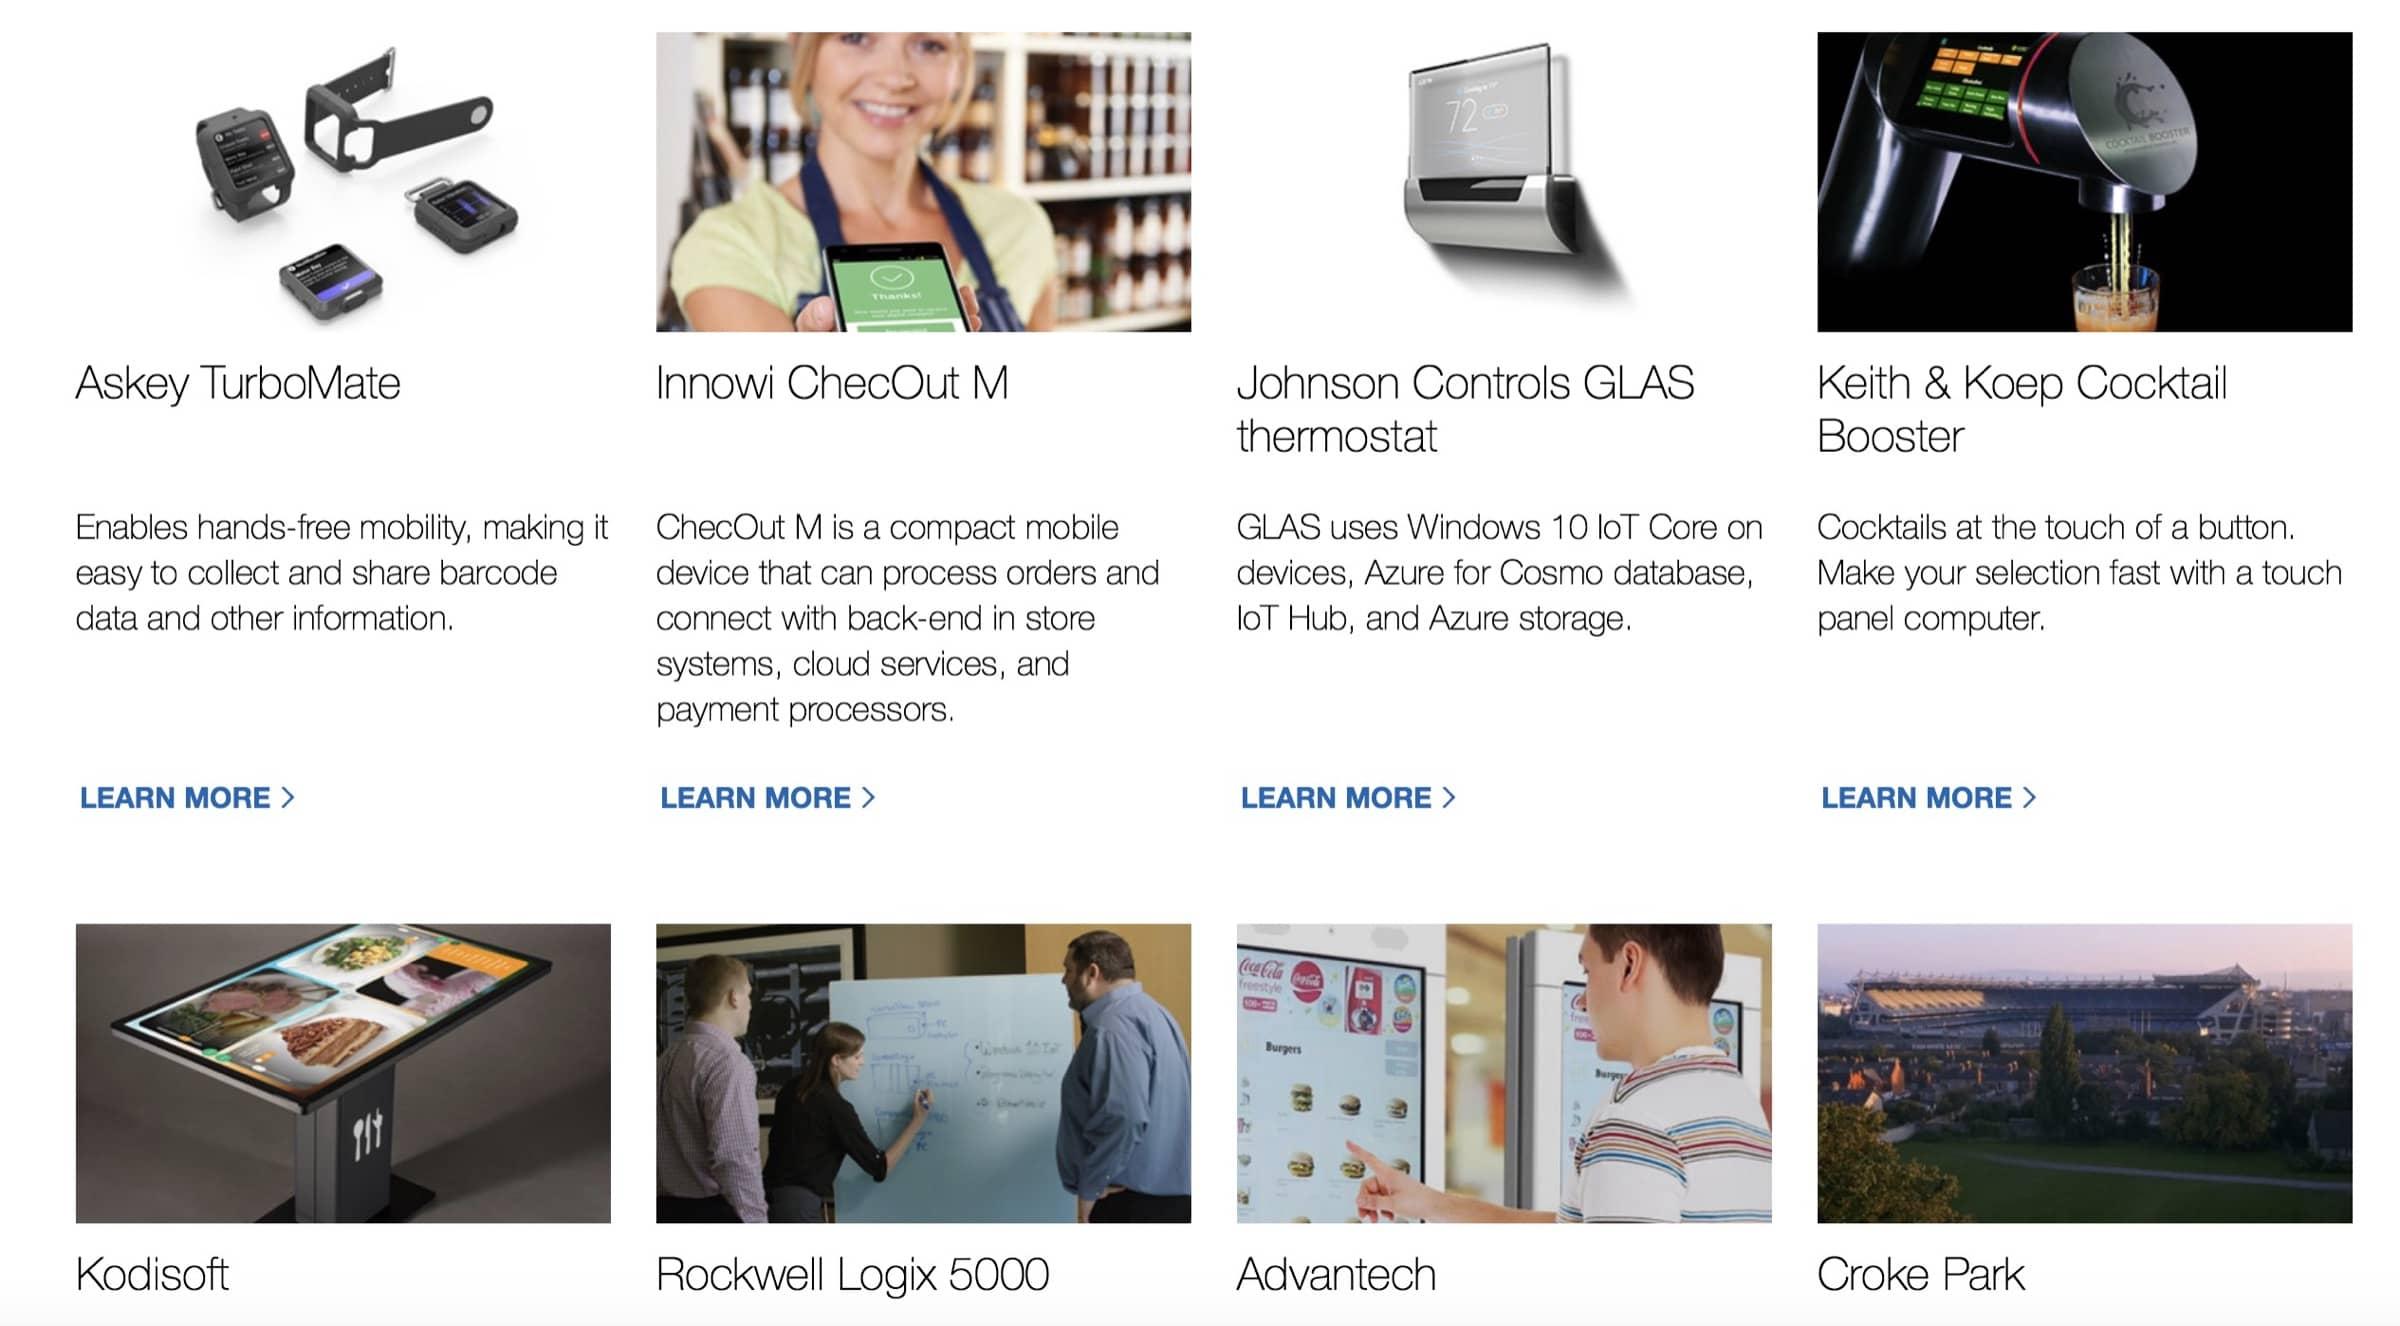 Bildquelle: https://www.microsoft.com/en-us/WindowsForBusiness/windows-iot